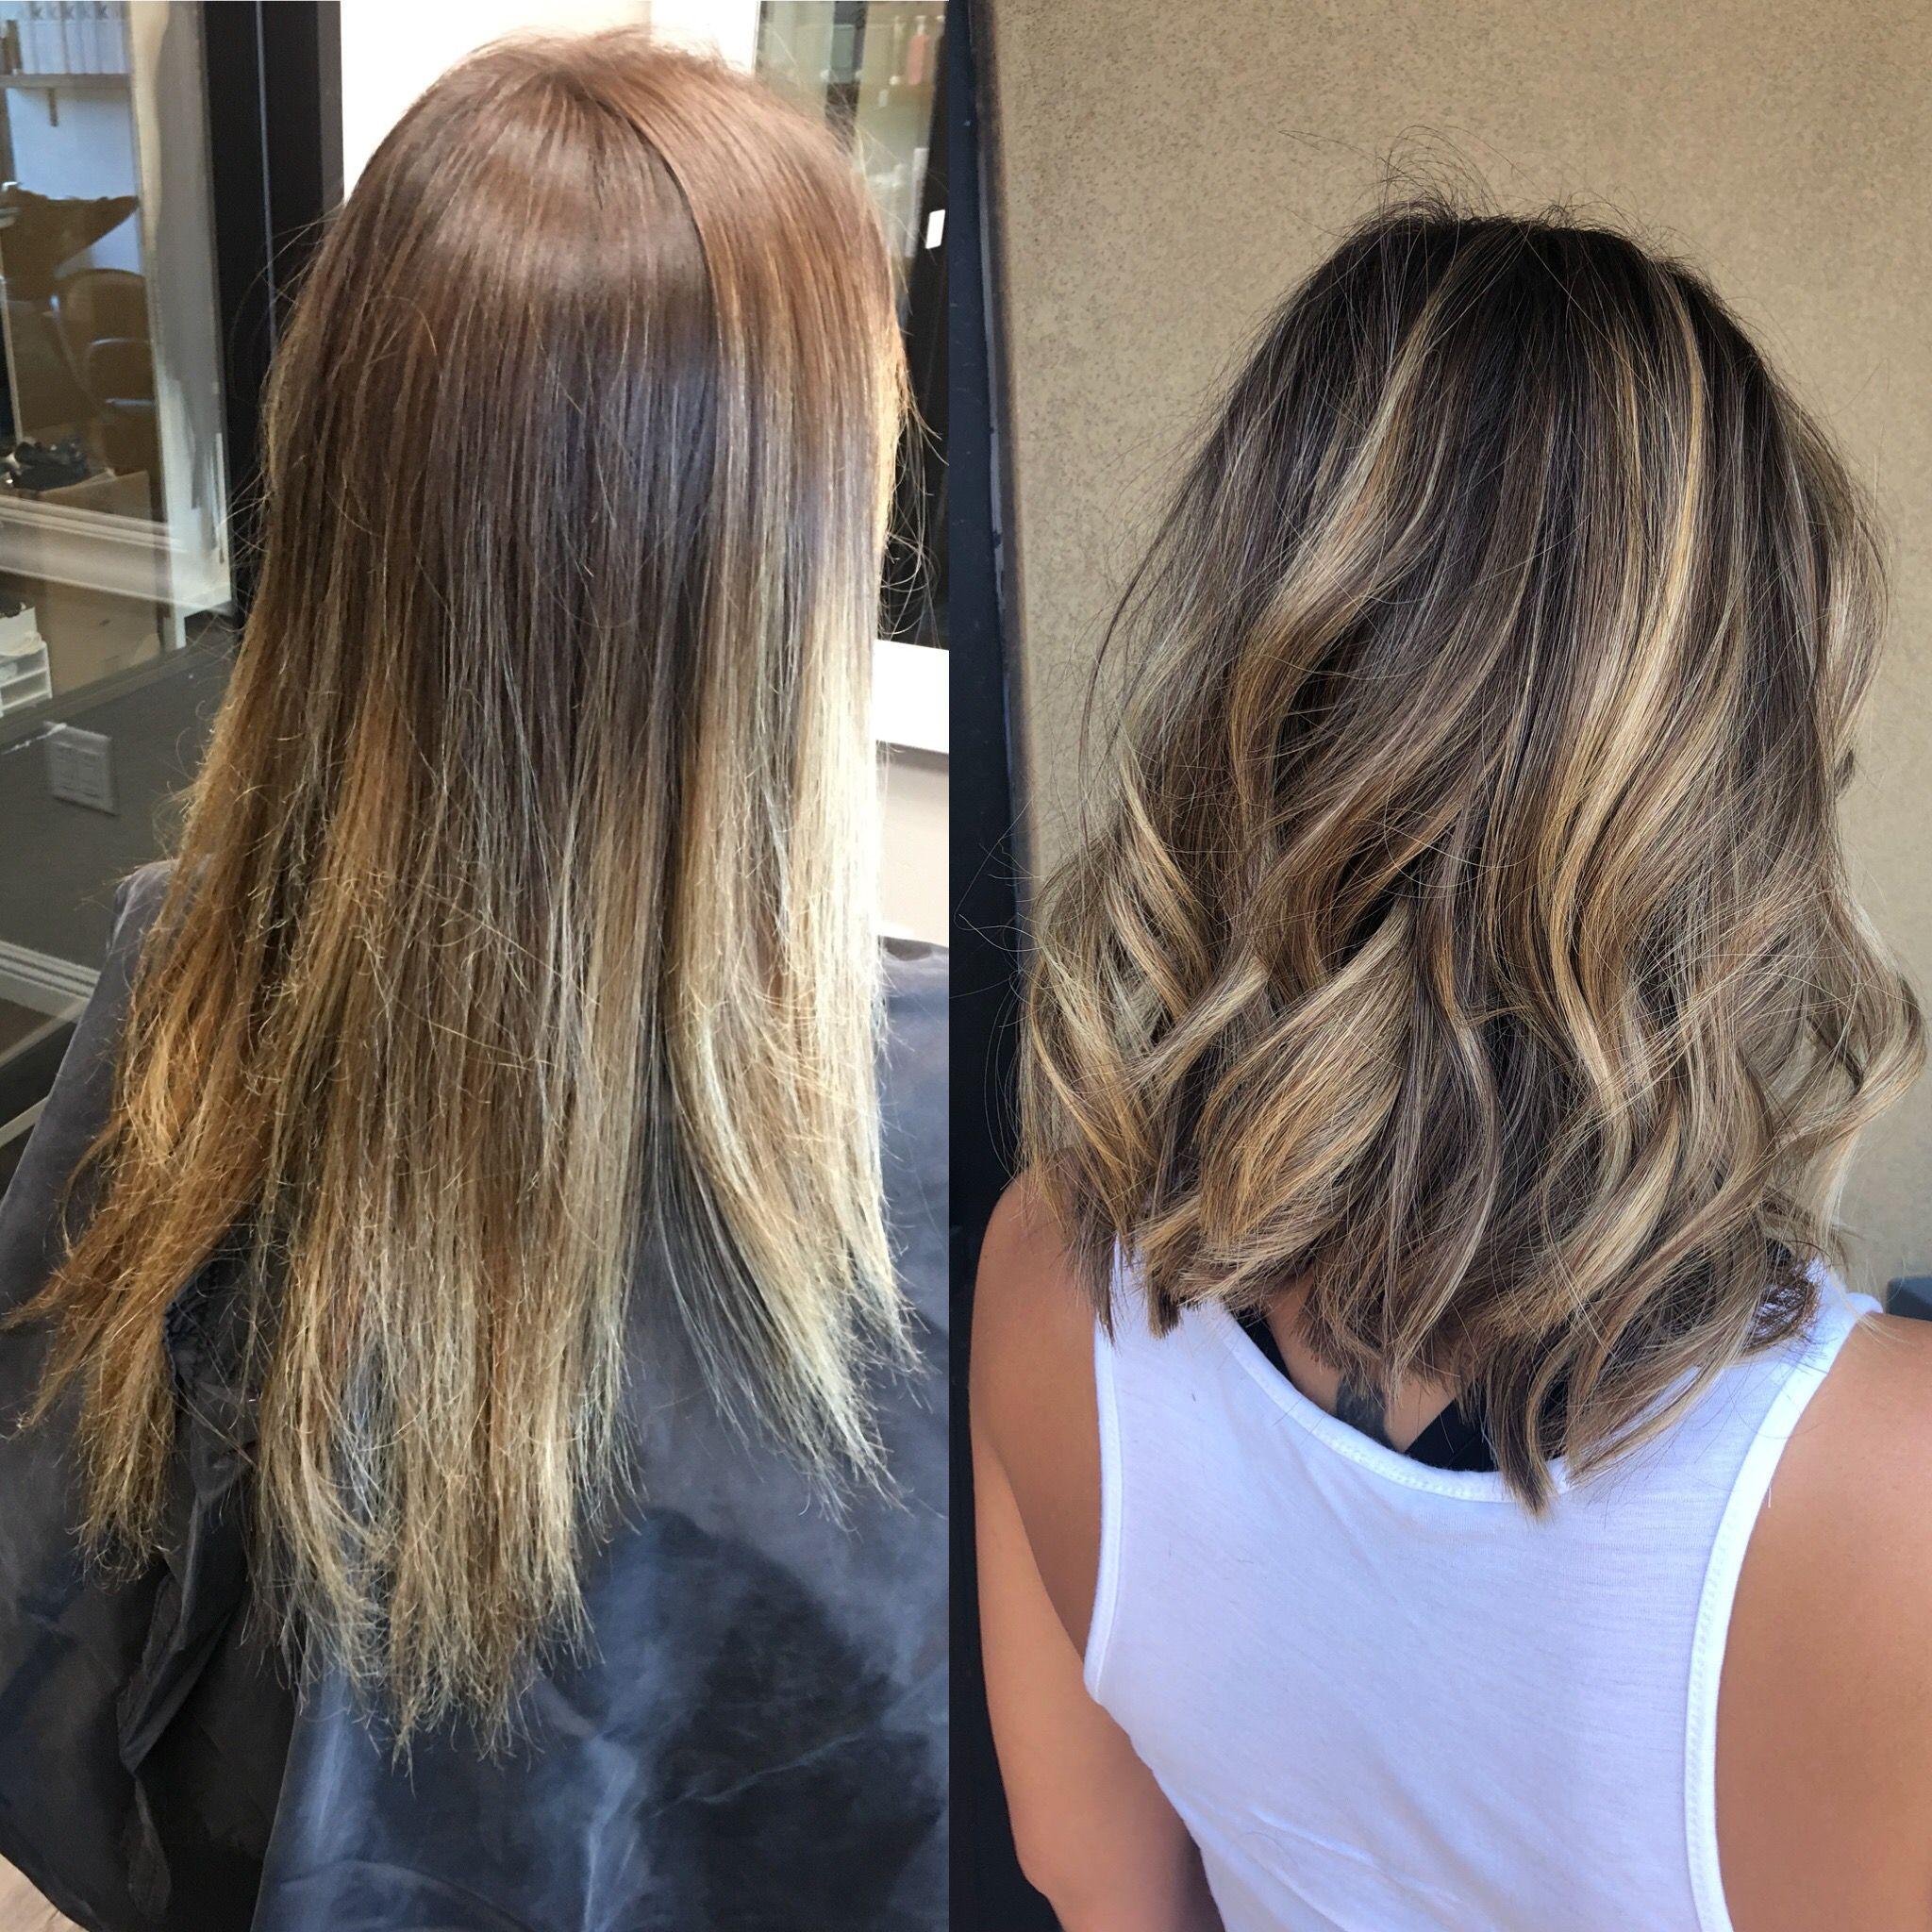 Before And After Balayage Shorthair Balayage Hair Short Hair Balayage Hair Color Balayage